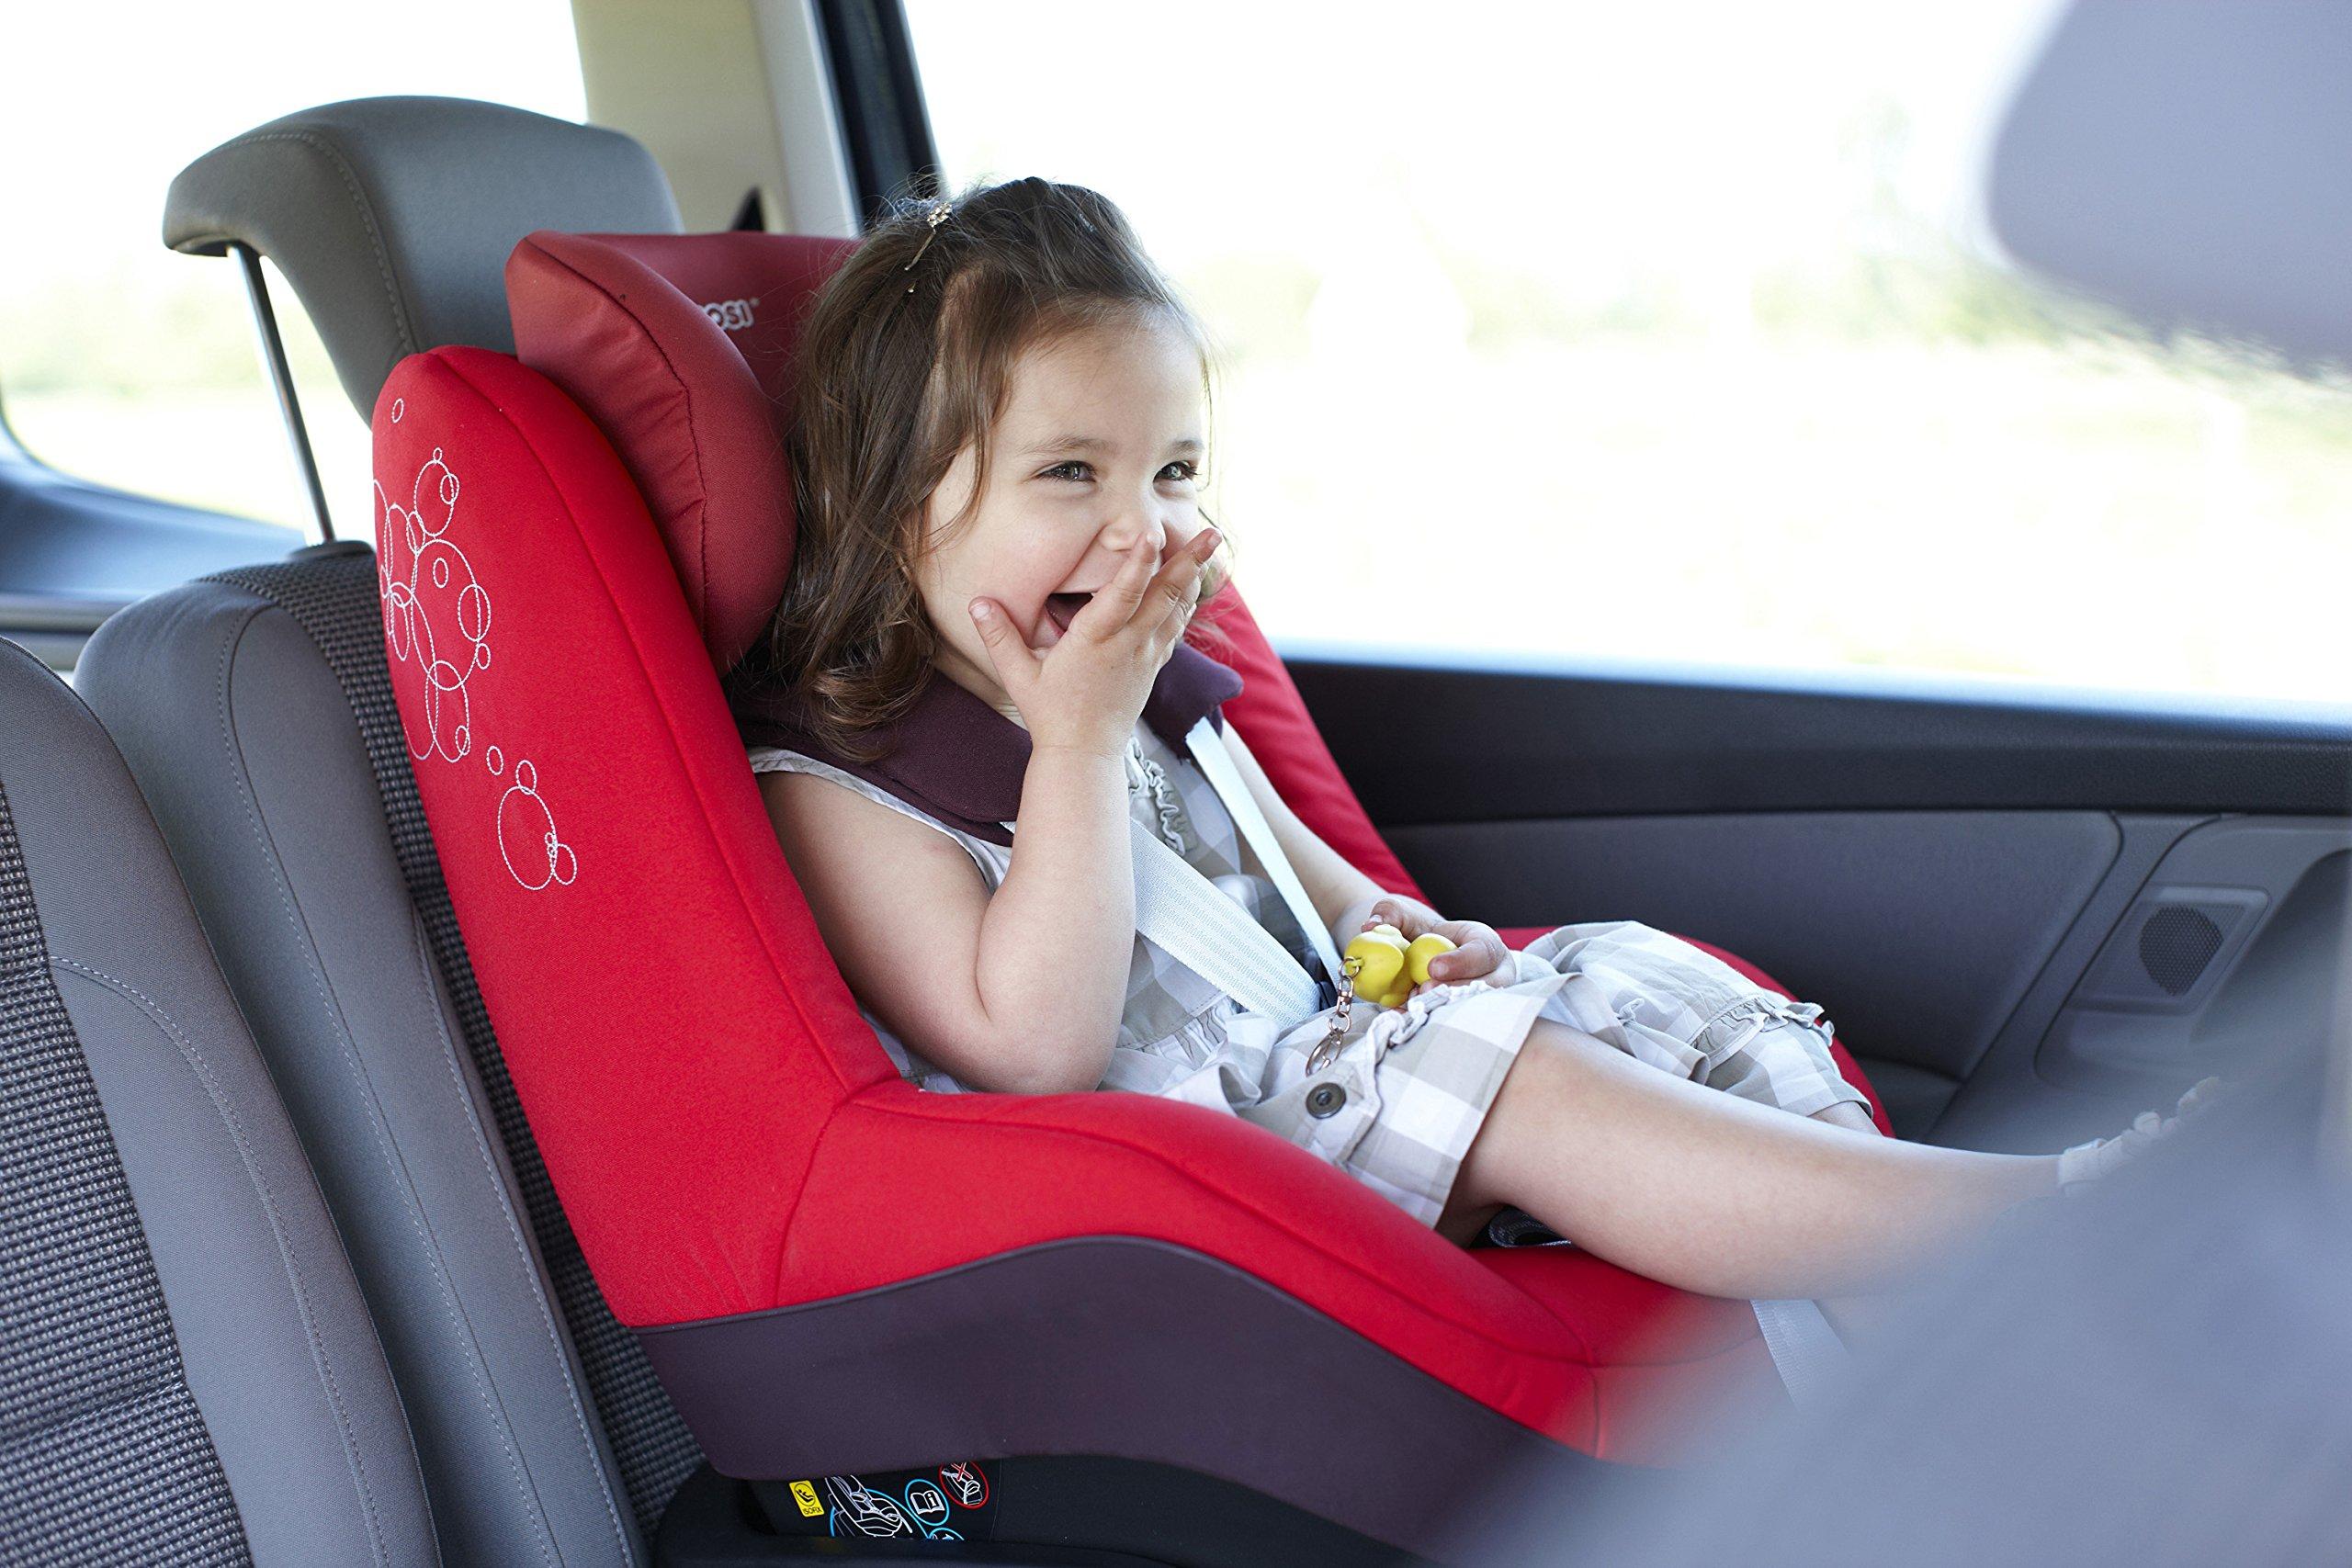 Maxi-Cosi 63409641Pearl Children's Seat, Group 1, 9-18kg Maxi-Cosi  21